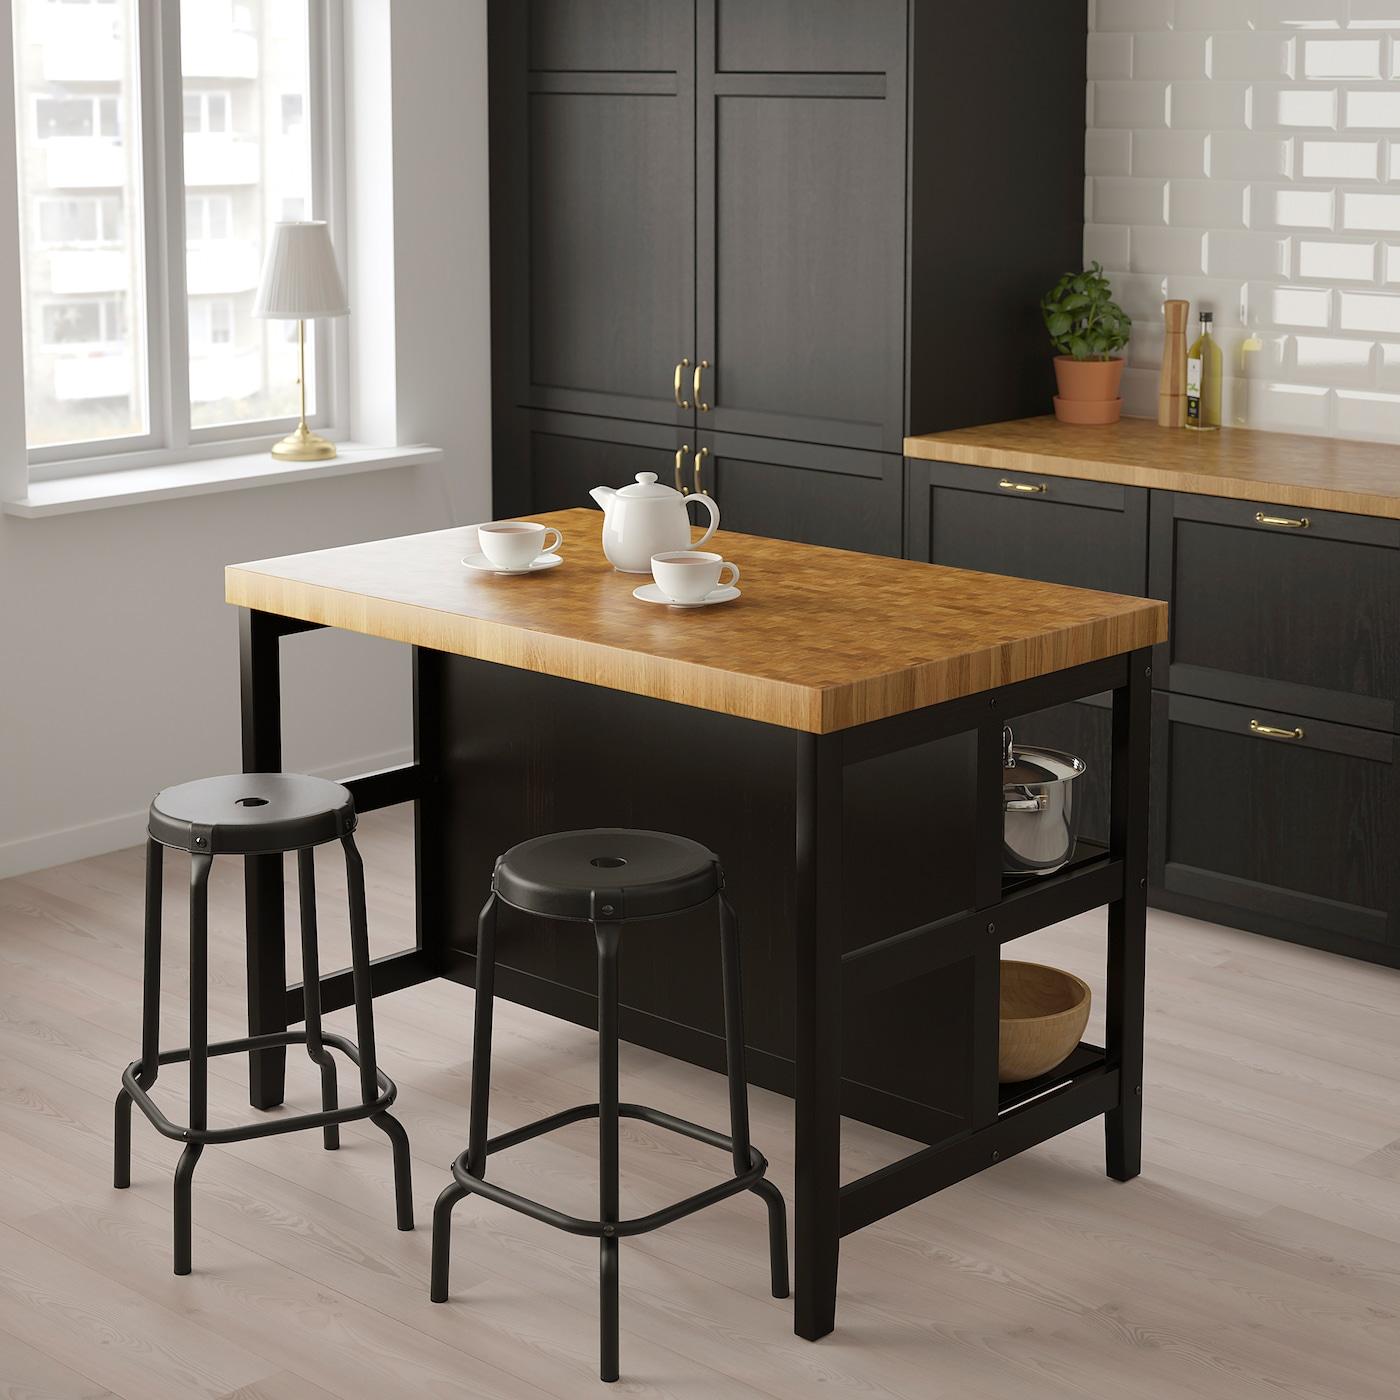 Picture of: Vadholma Kitchen Island Black Oak Shop Here Ikea